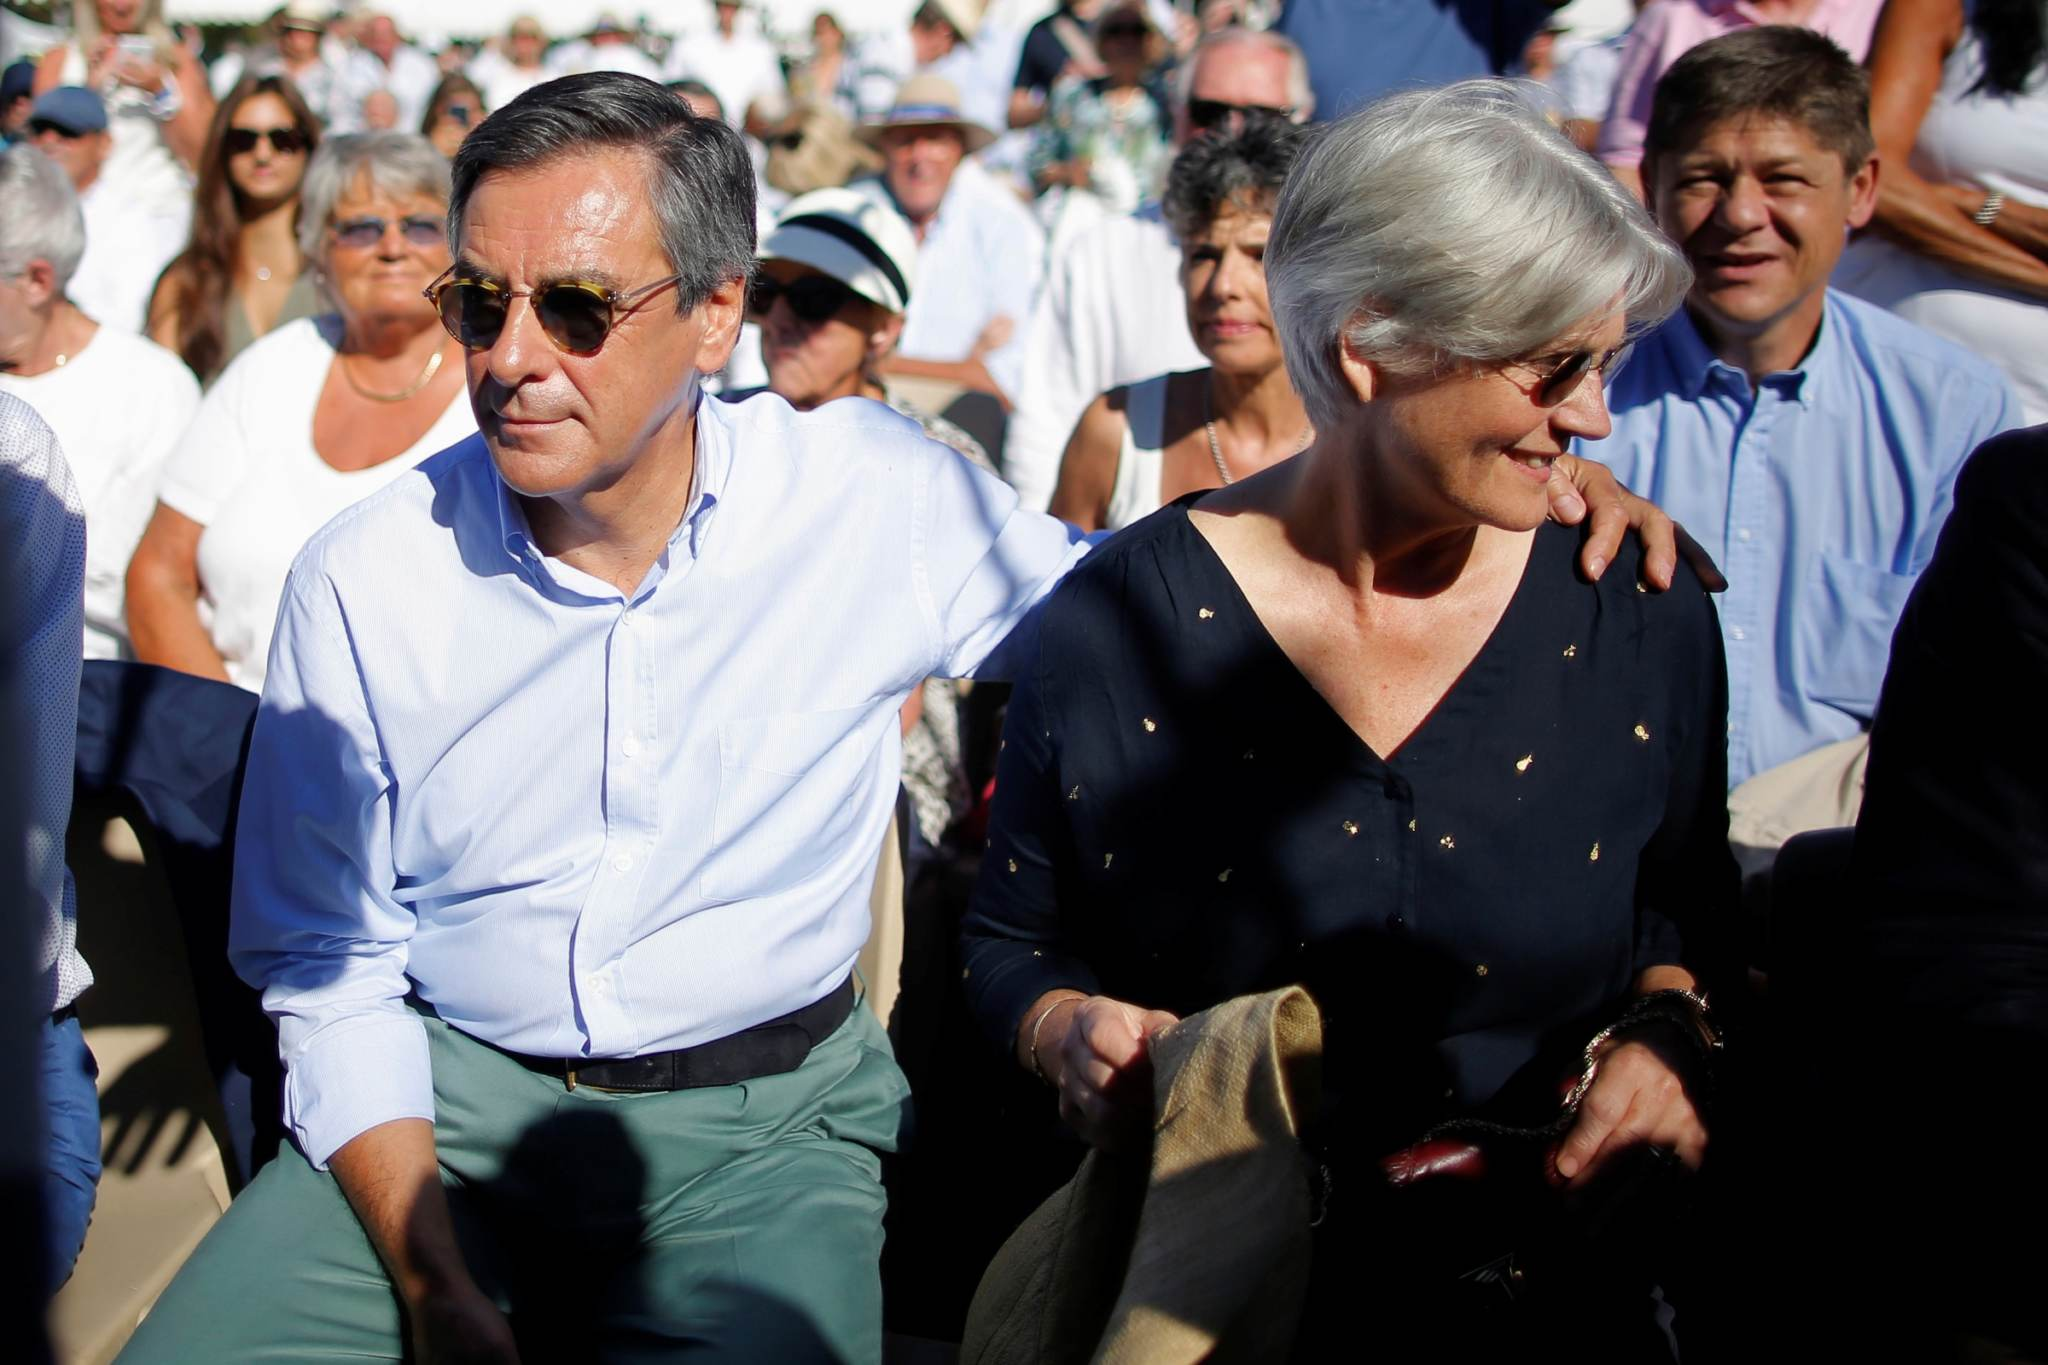 François Fillon sel sügisel koos abikaasa Penelopega erakonna üritusel. Foto: Stephane Mahe, Reuters/Scanpix